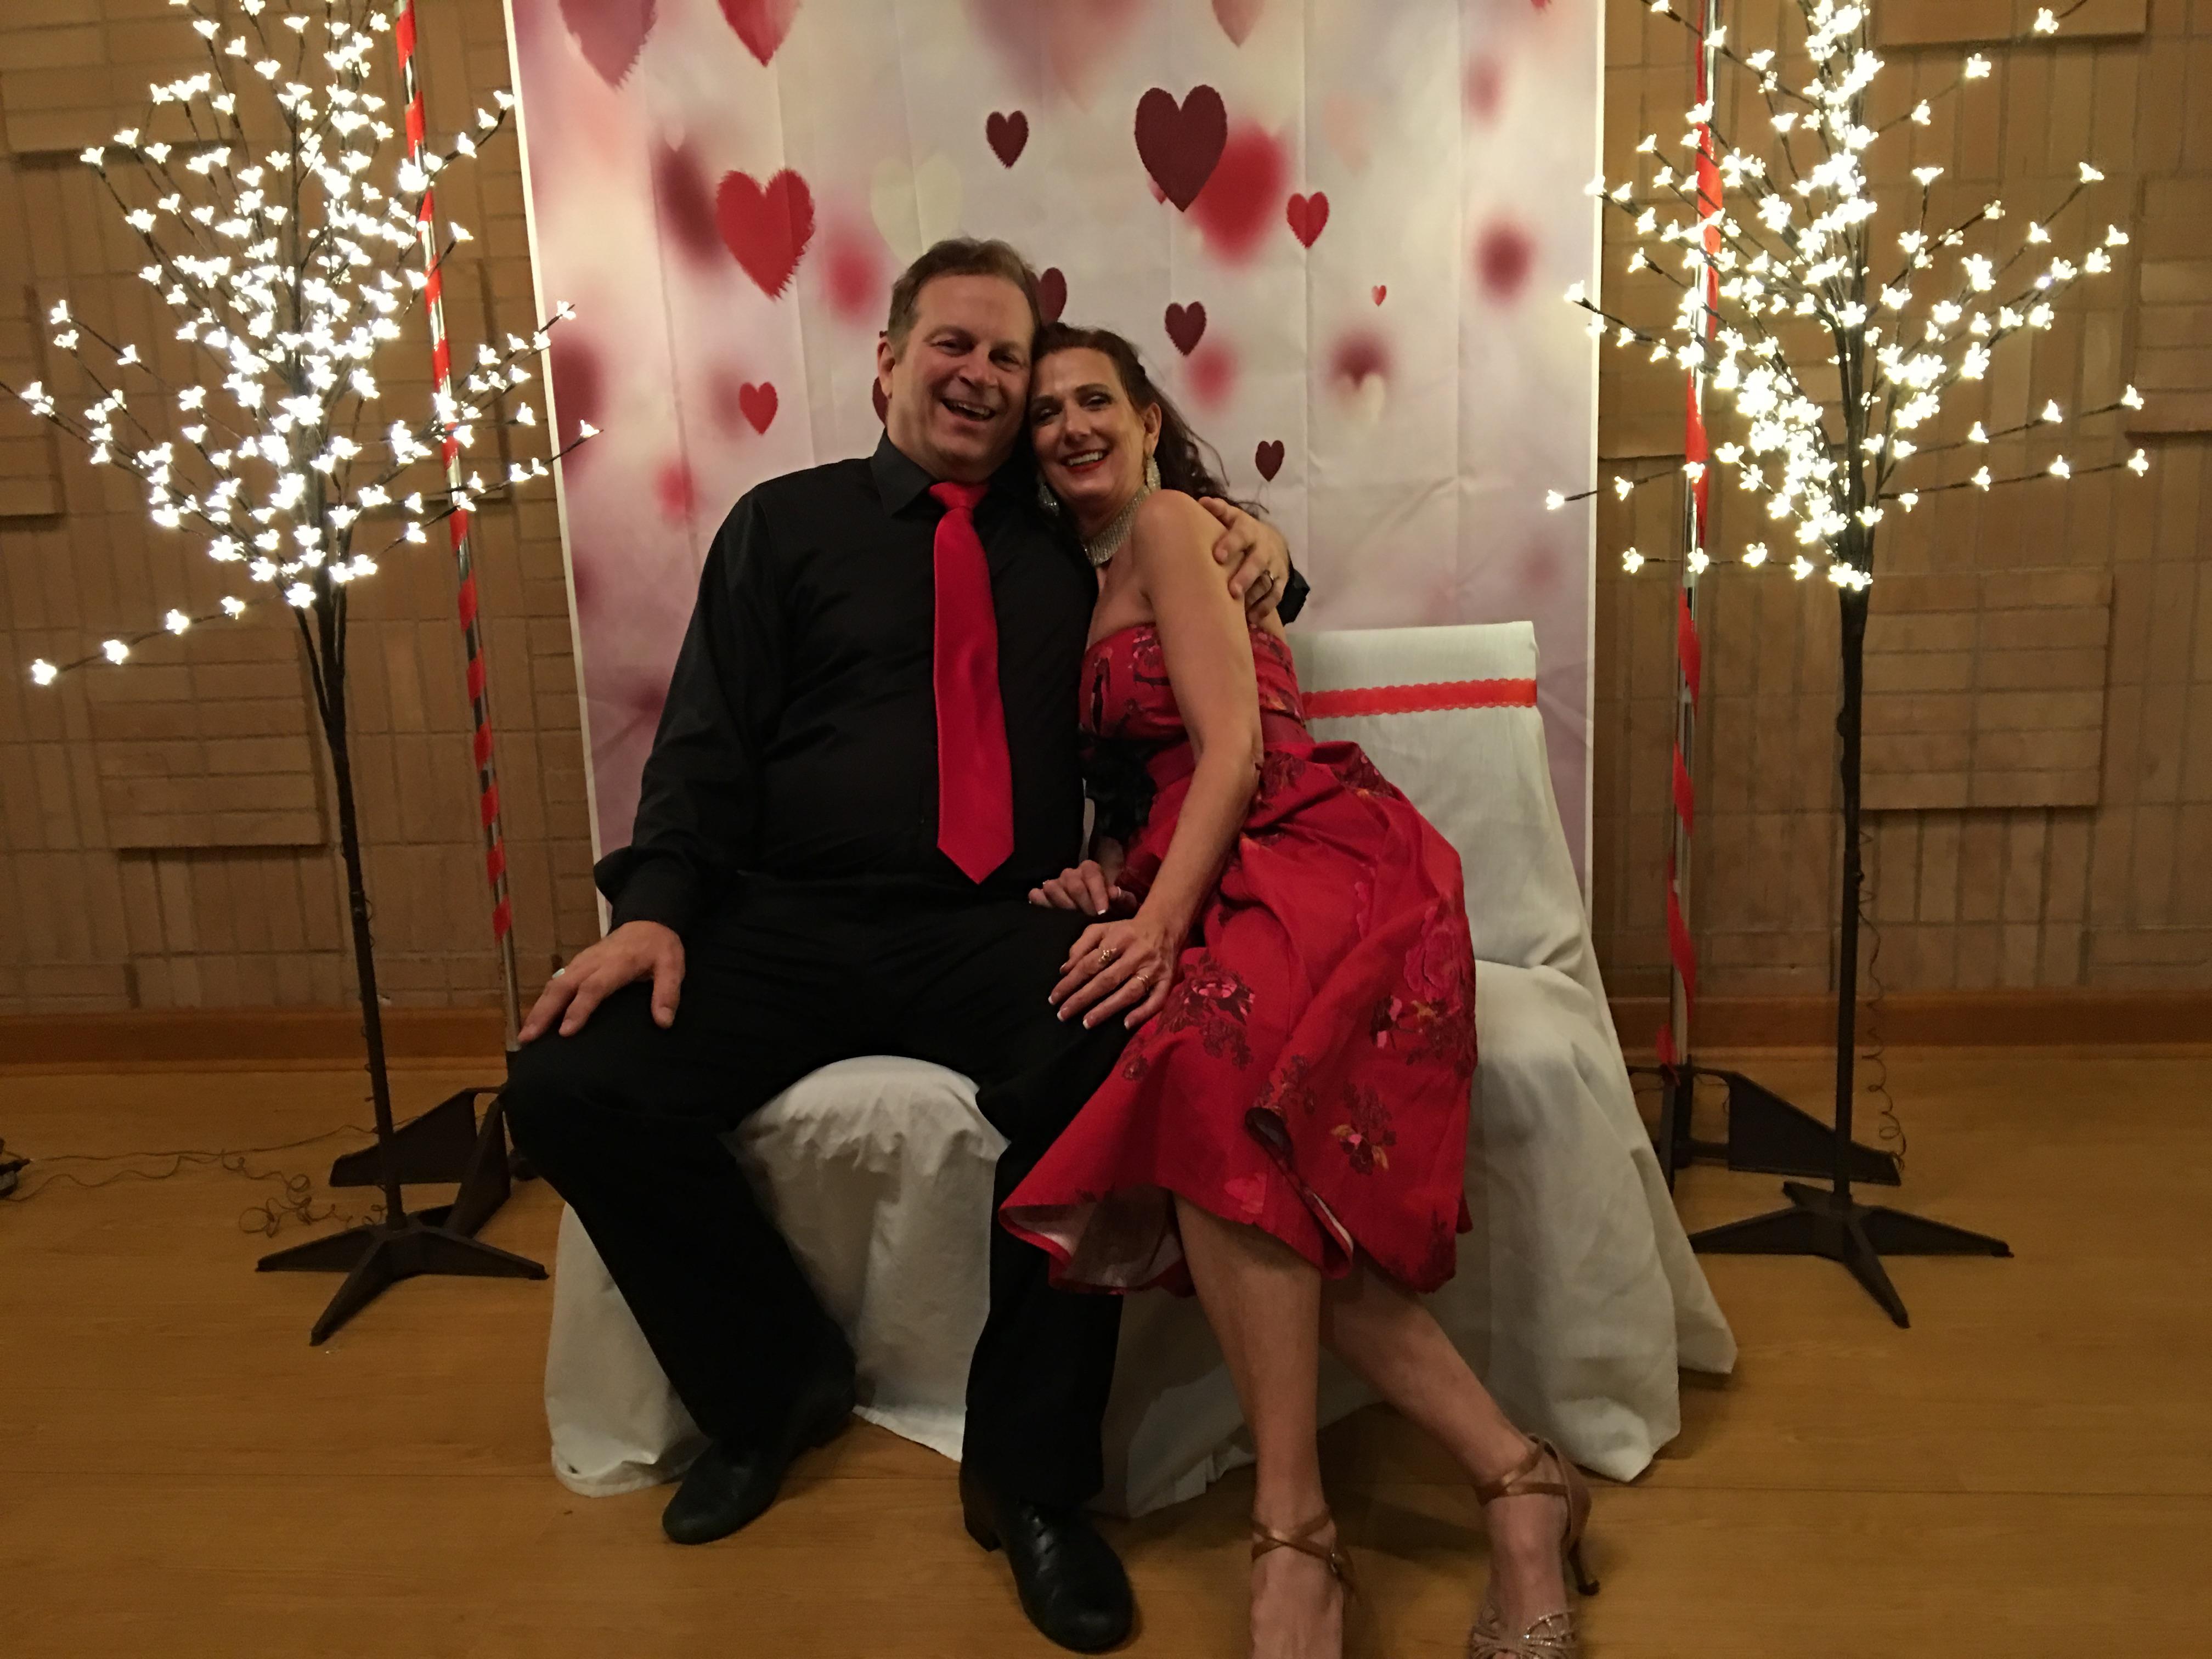 2017 February Sweetheart Dance